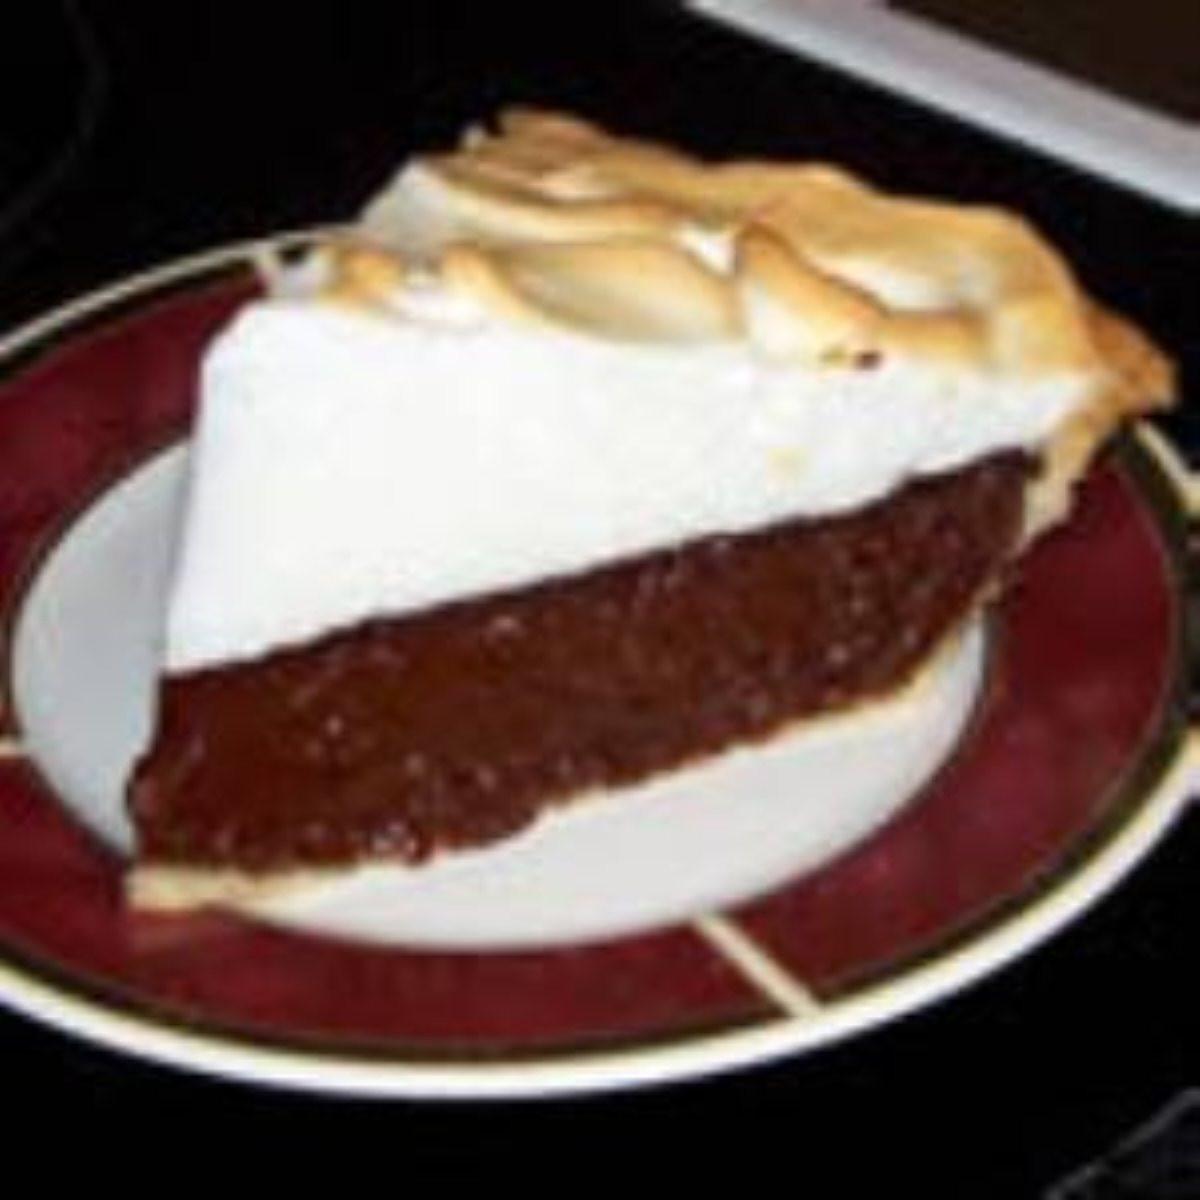 Chocolate Pie With Cocoa  Vern s Chocolate Pie BigOven